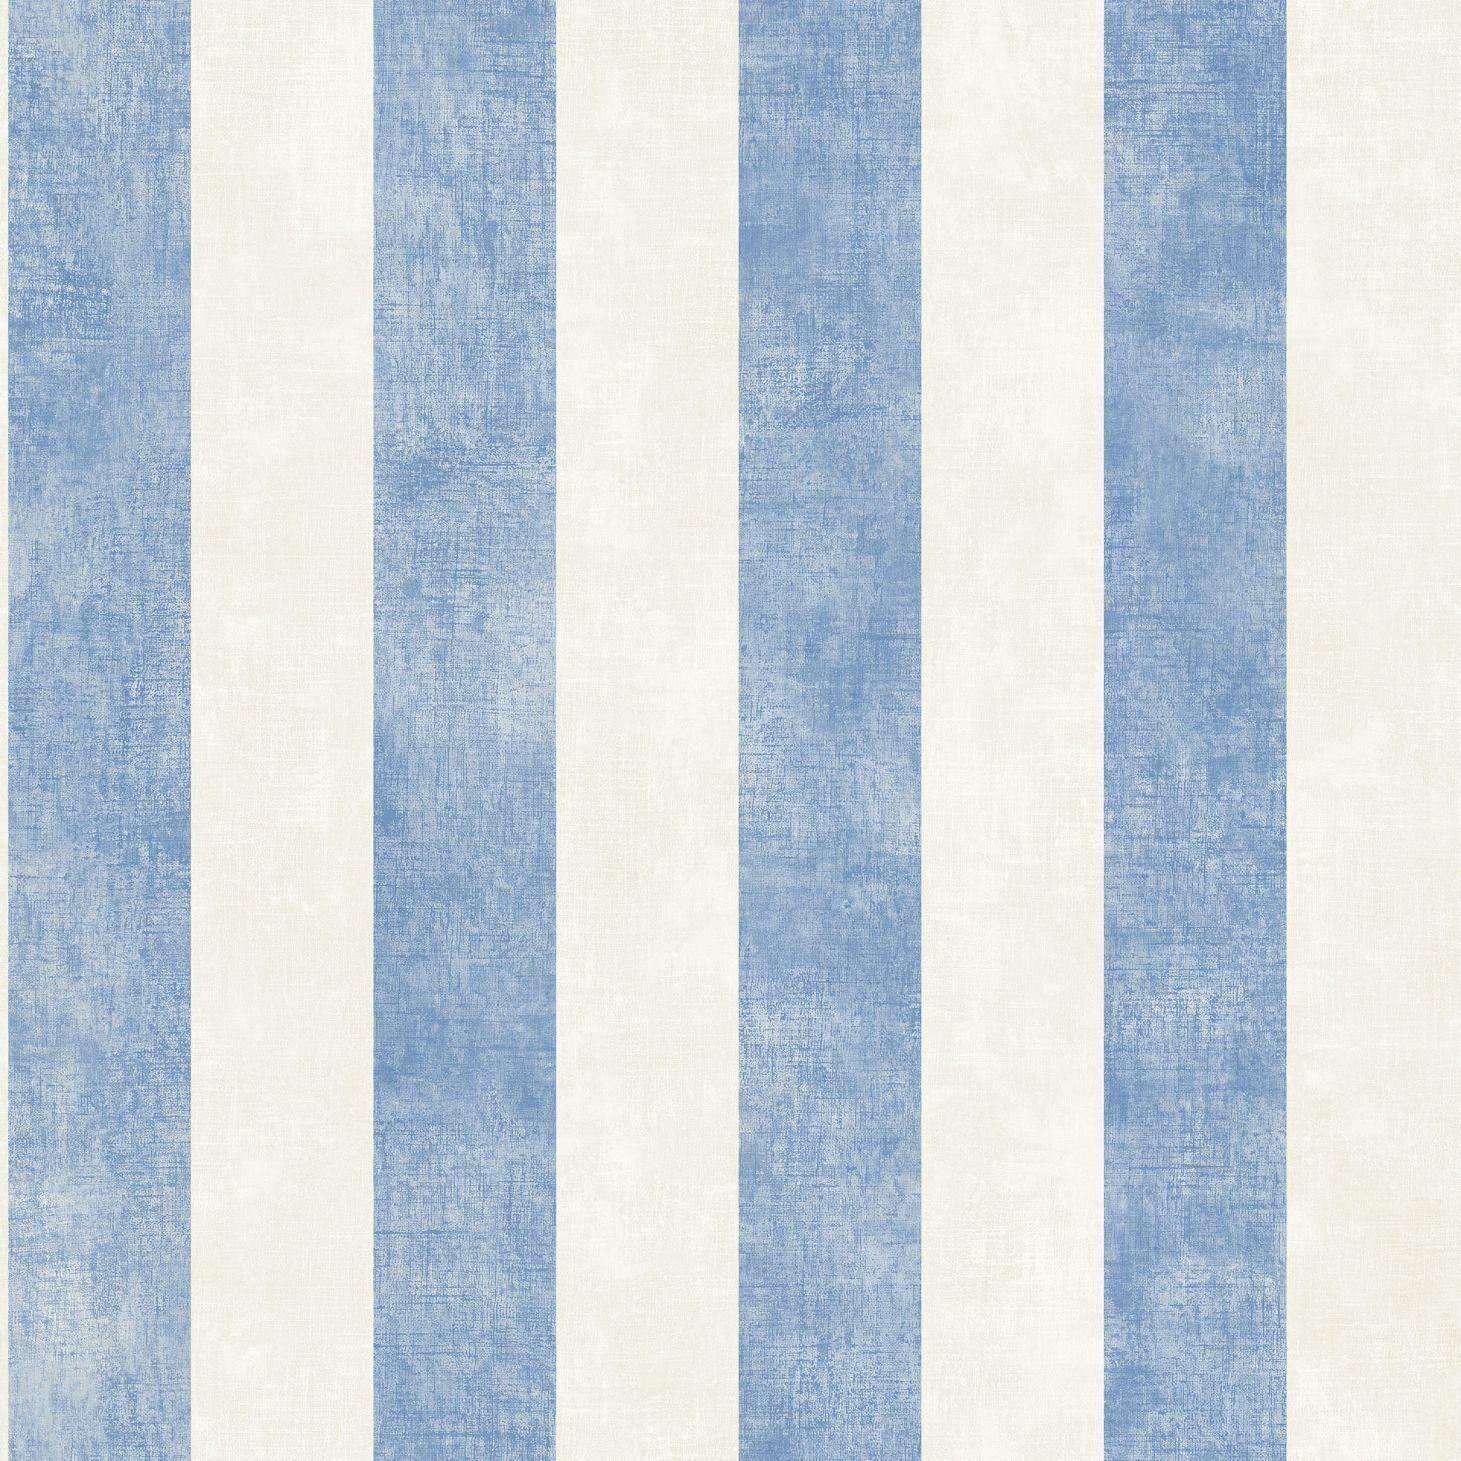 Essener Tapete Simply Stripes 3 Sd36158 blue Strisce Righe Tappezzeria in Vinile